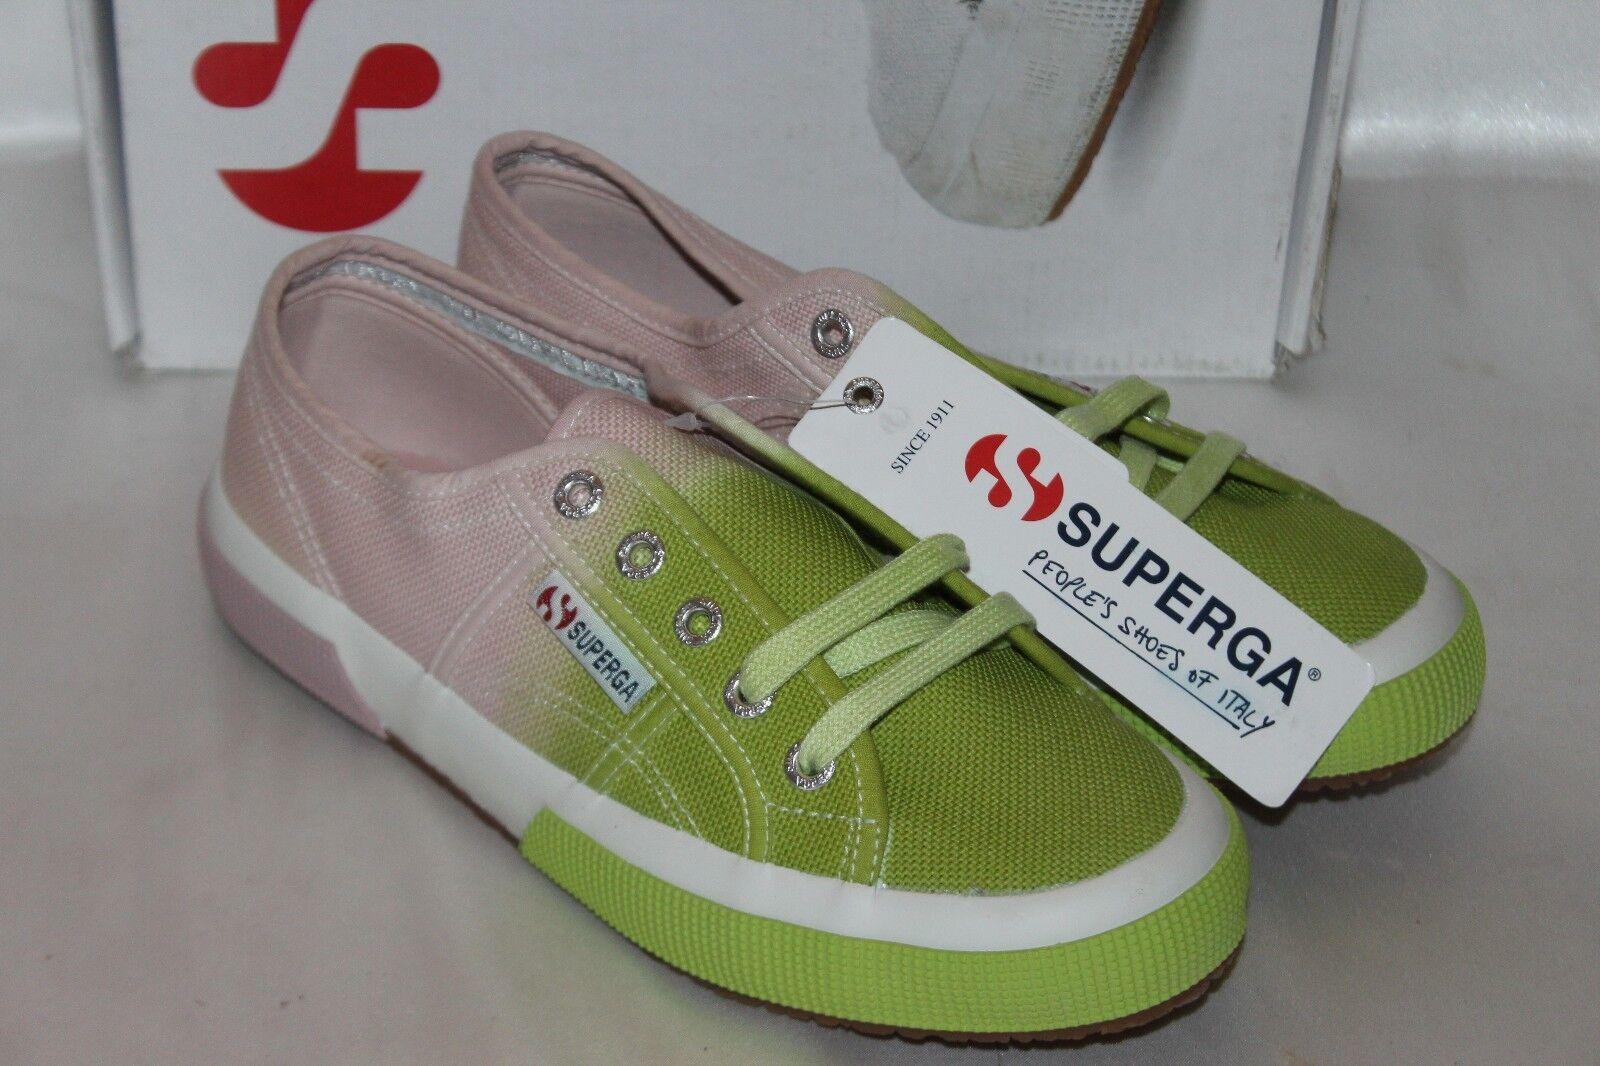 NEW SUPERGA Lavender pink Canvas 2750 Cotu Shade Sneakers Tennis shoes 6.5 EU37